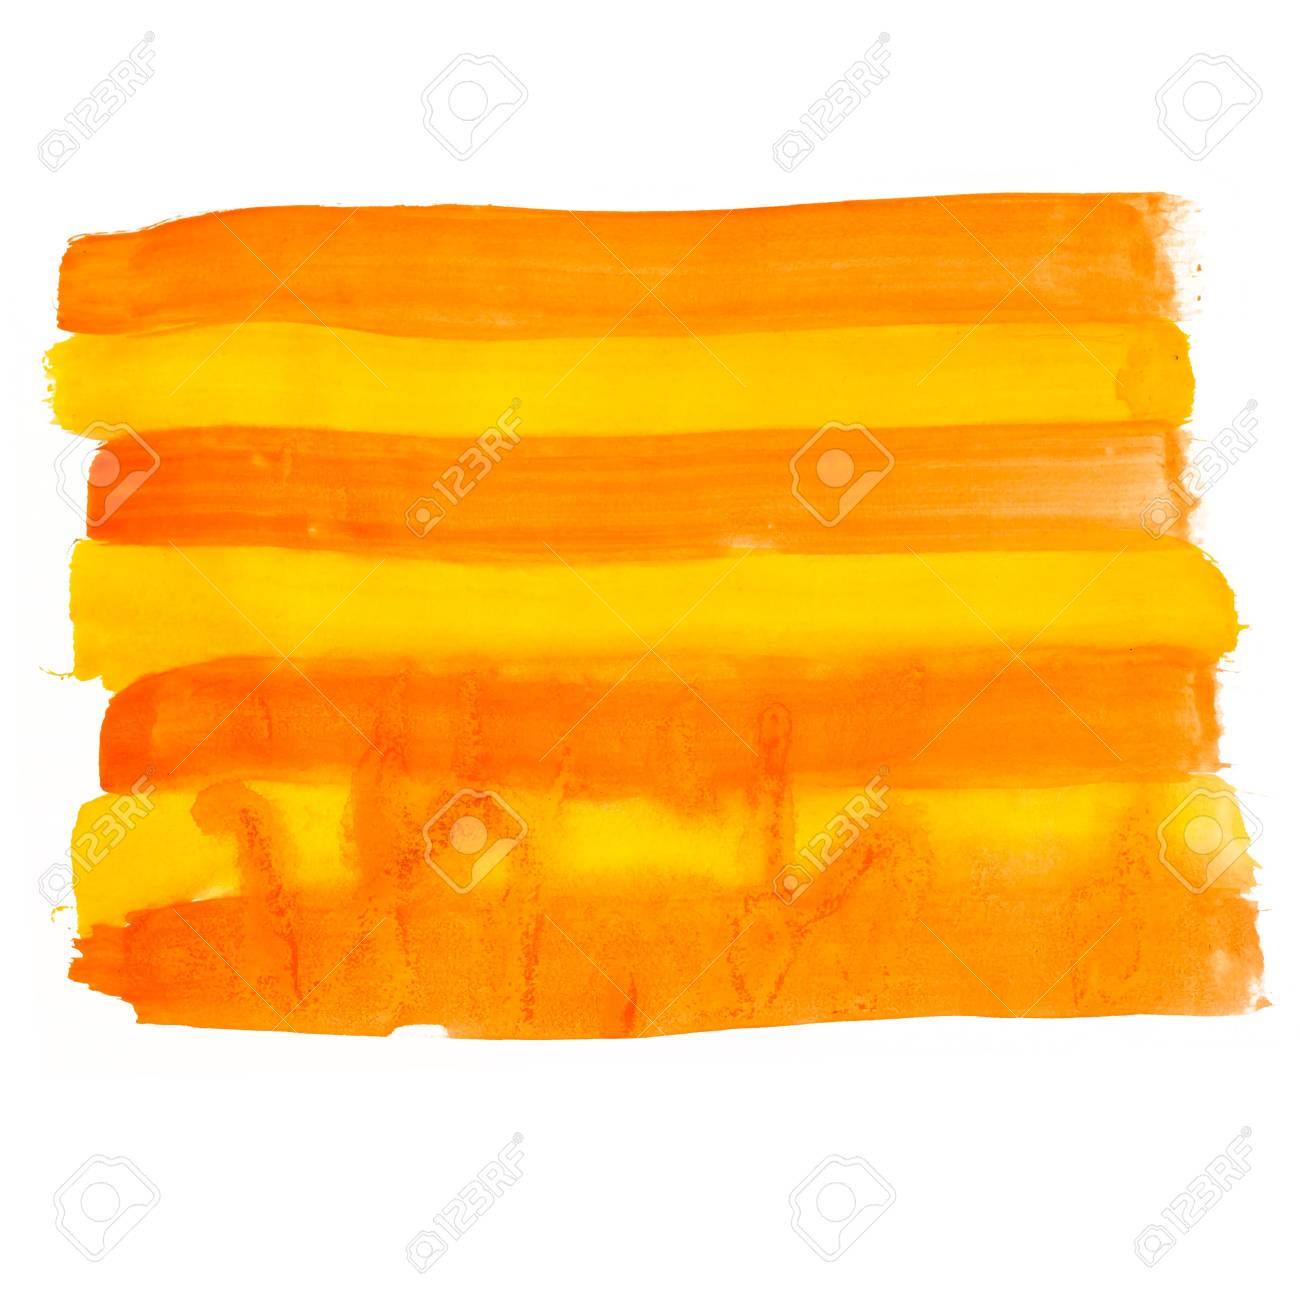 orange line watercolors spot blotch isolated Stock Photo - 16861699